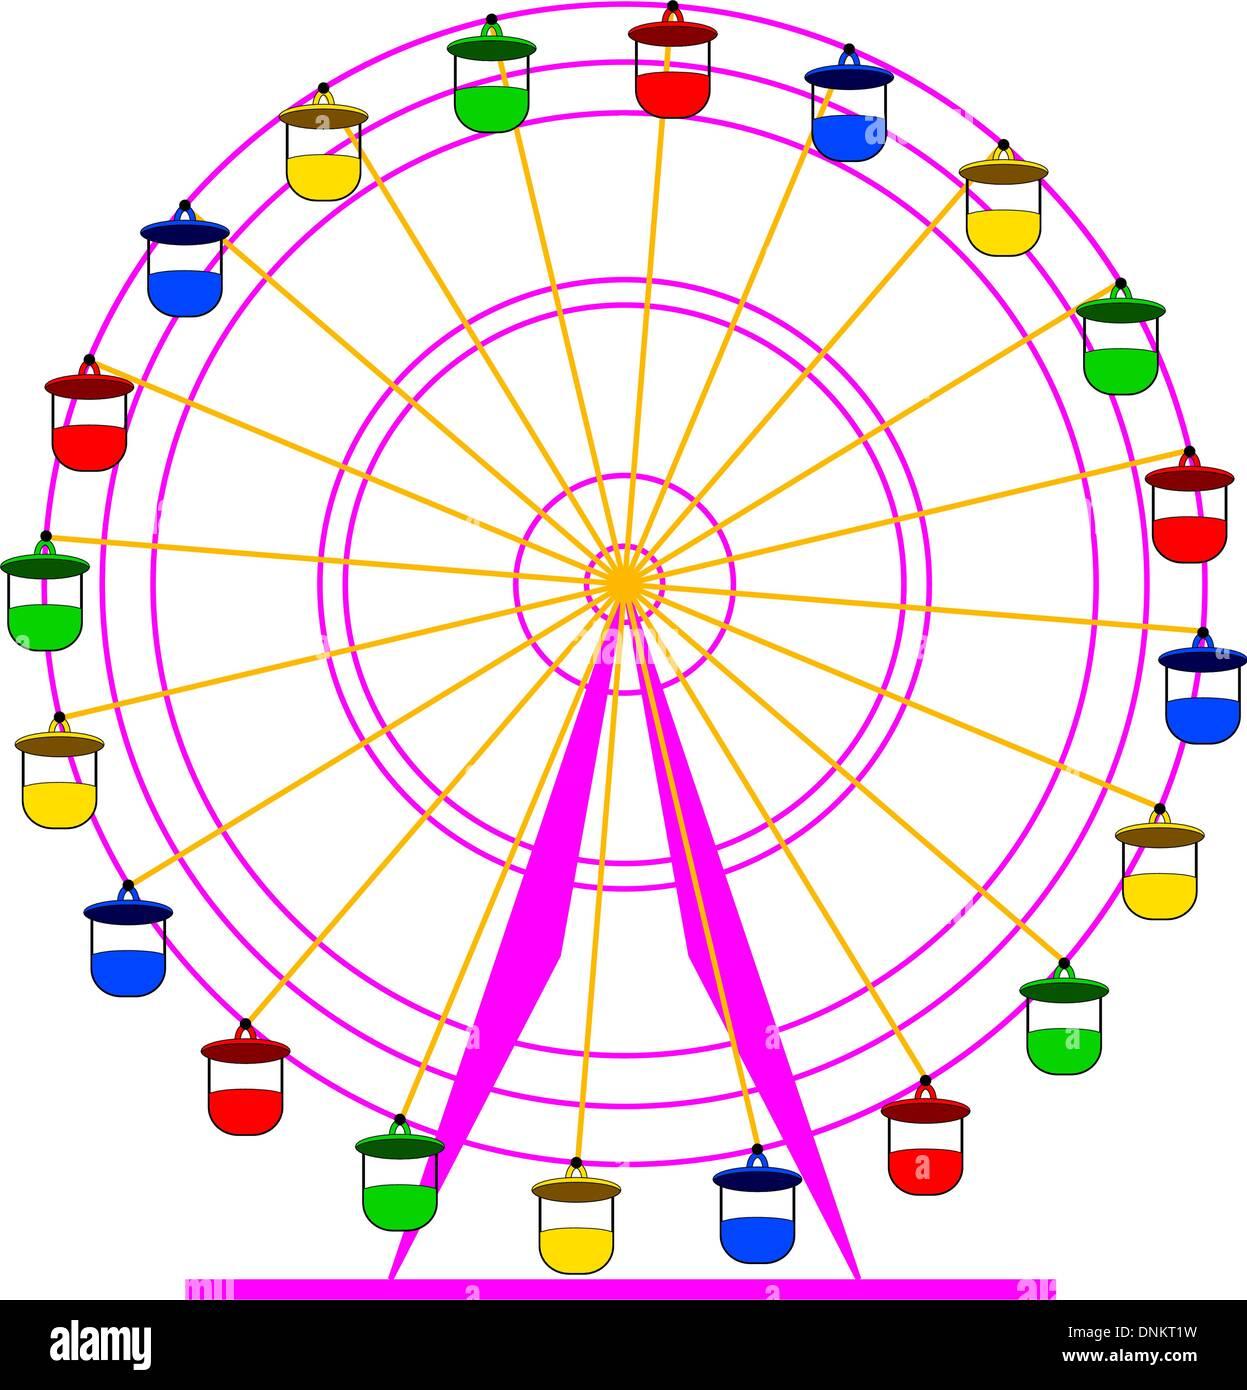 Silhouette atraktsion colorful ferris wheel. Vector  illustration. Stock Vector